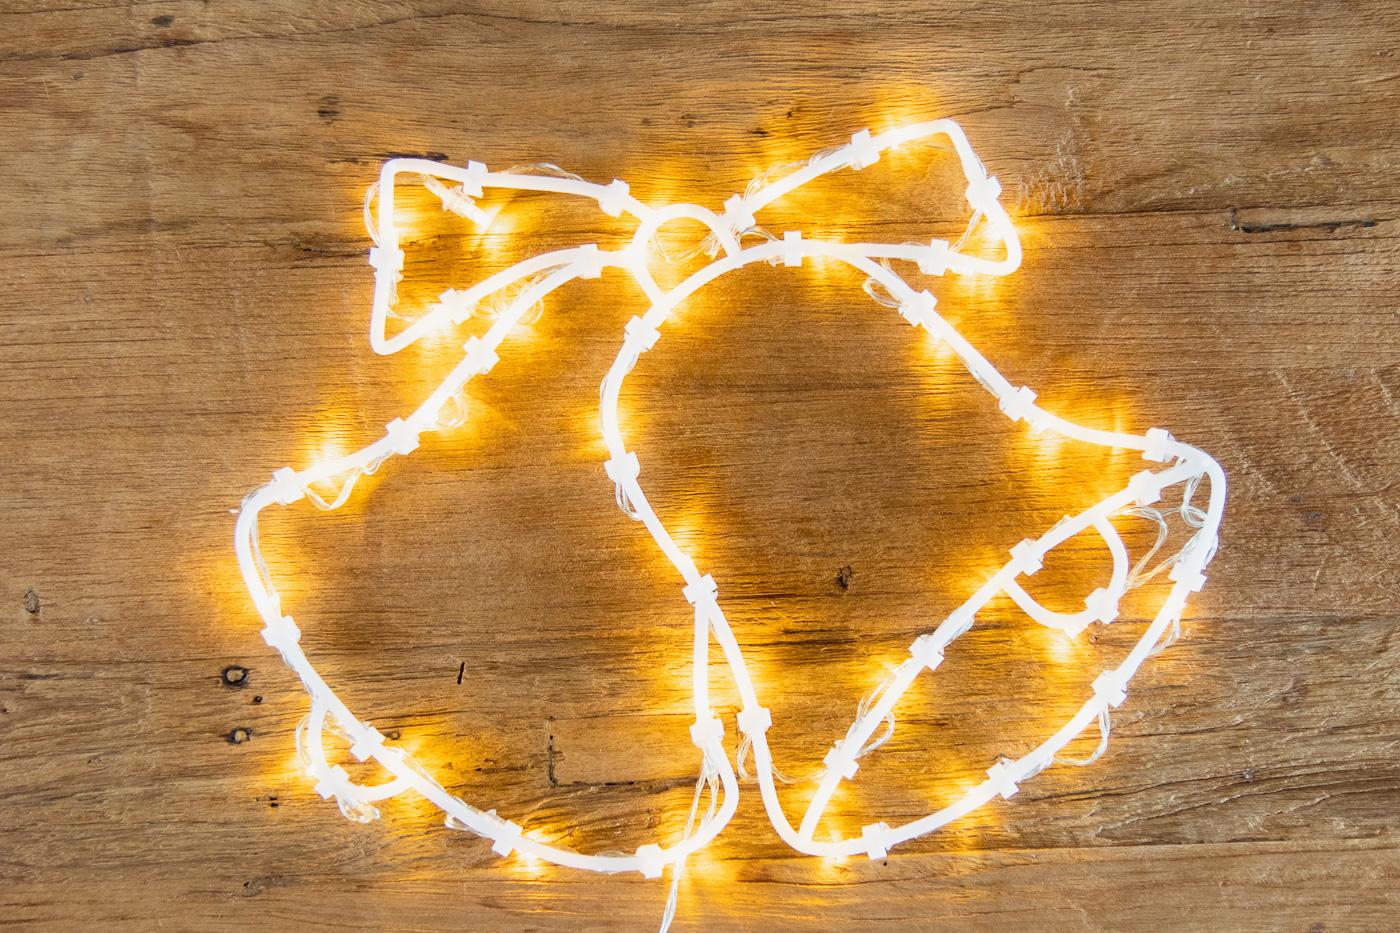 Full Size of Weihnachtsbeleuchtung Fenster Innen Batteriebetrieben Amazon Mit Kabel Ohne Kabellos Led Silhouette Figuren Hornbach Befestigen Stern Pyramide Bunt Batterie 2 Fenster Weihnachtsbeleuchtung Fenster